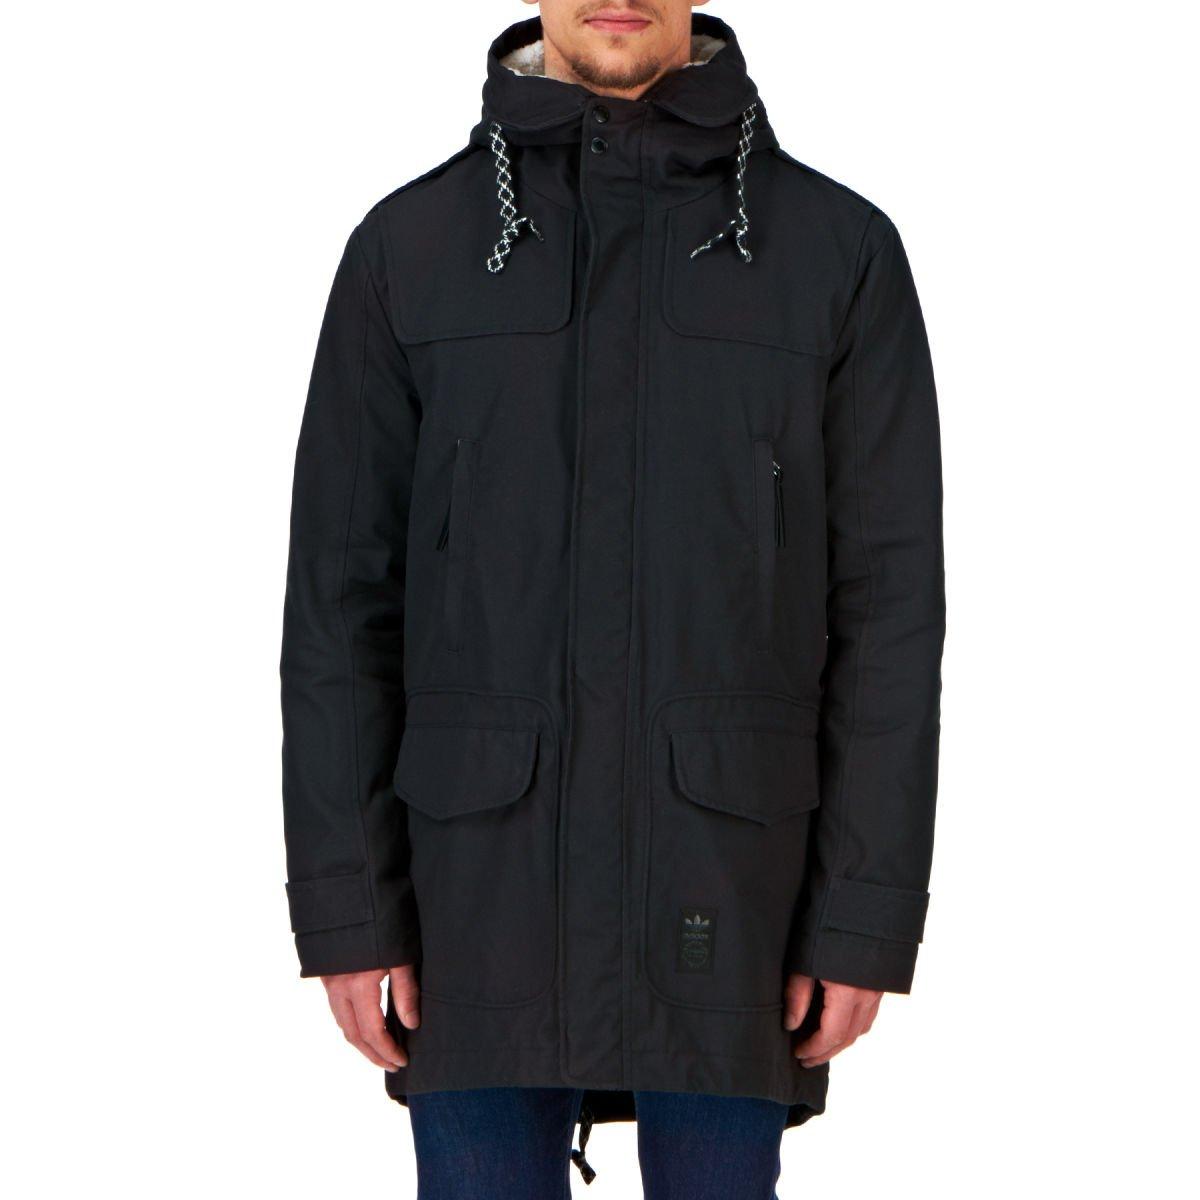 Adidas Originals Storm Jacket - Black